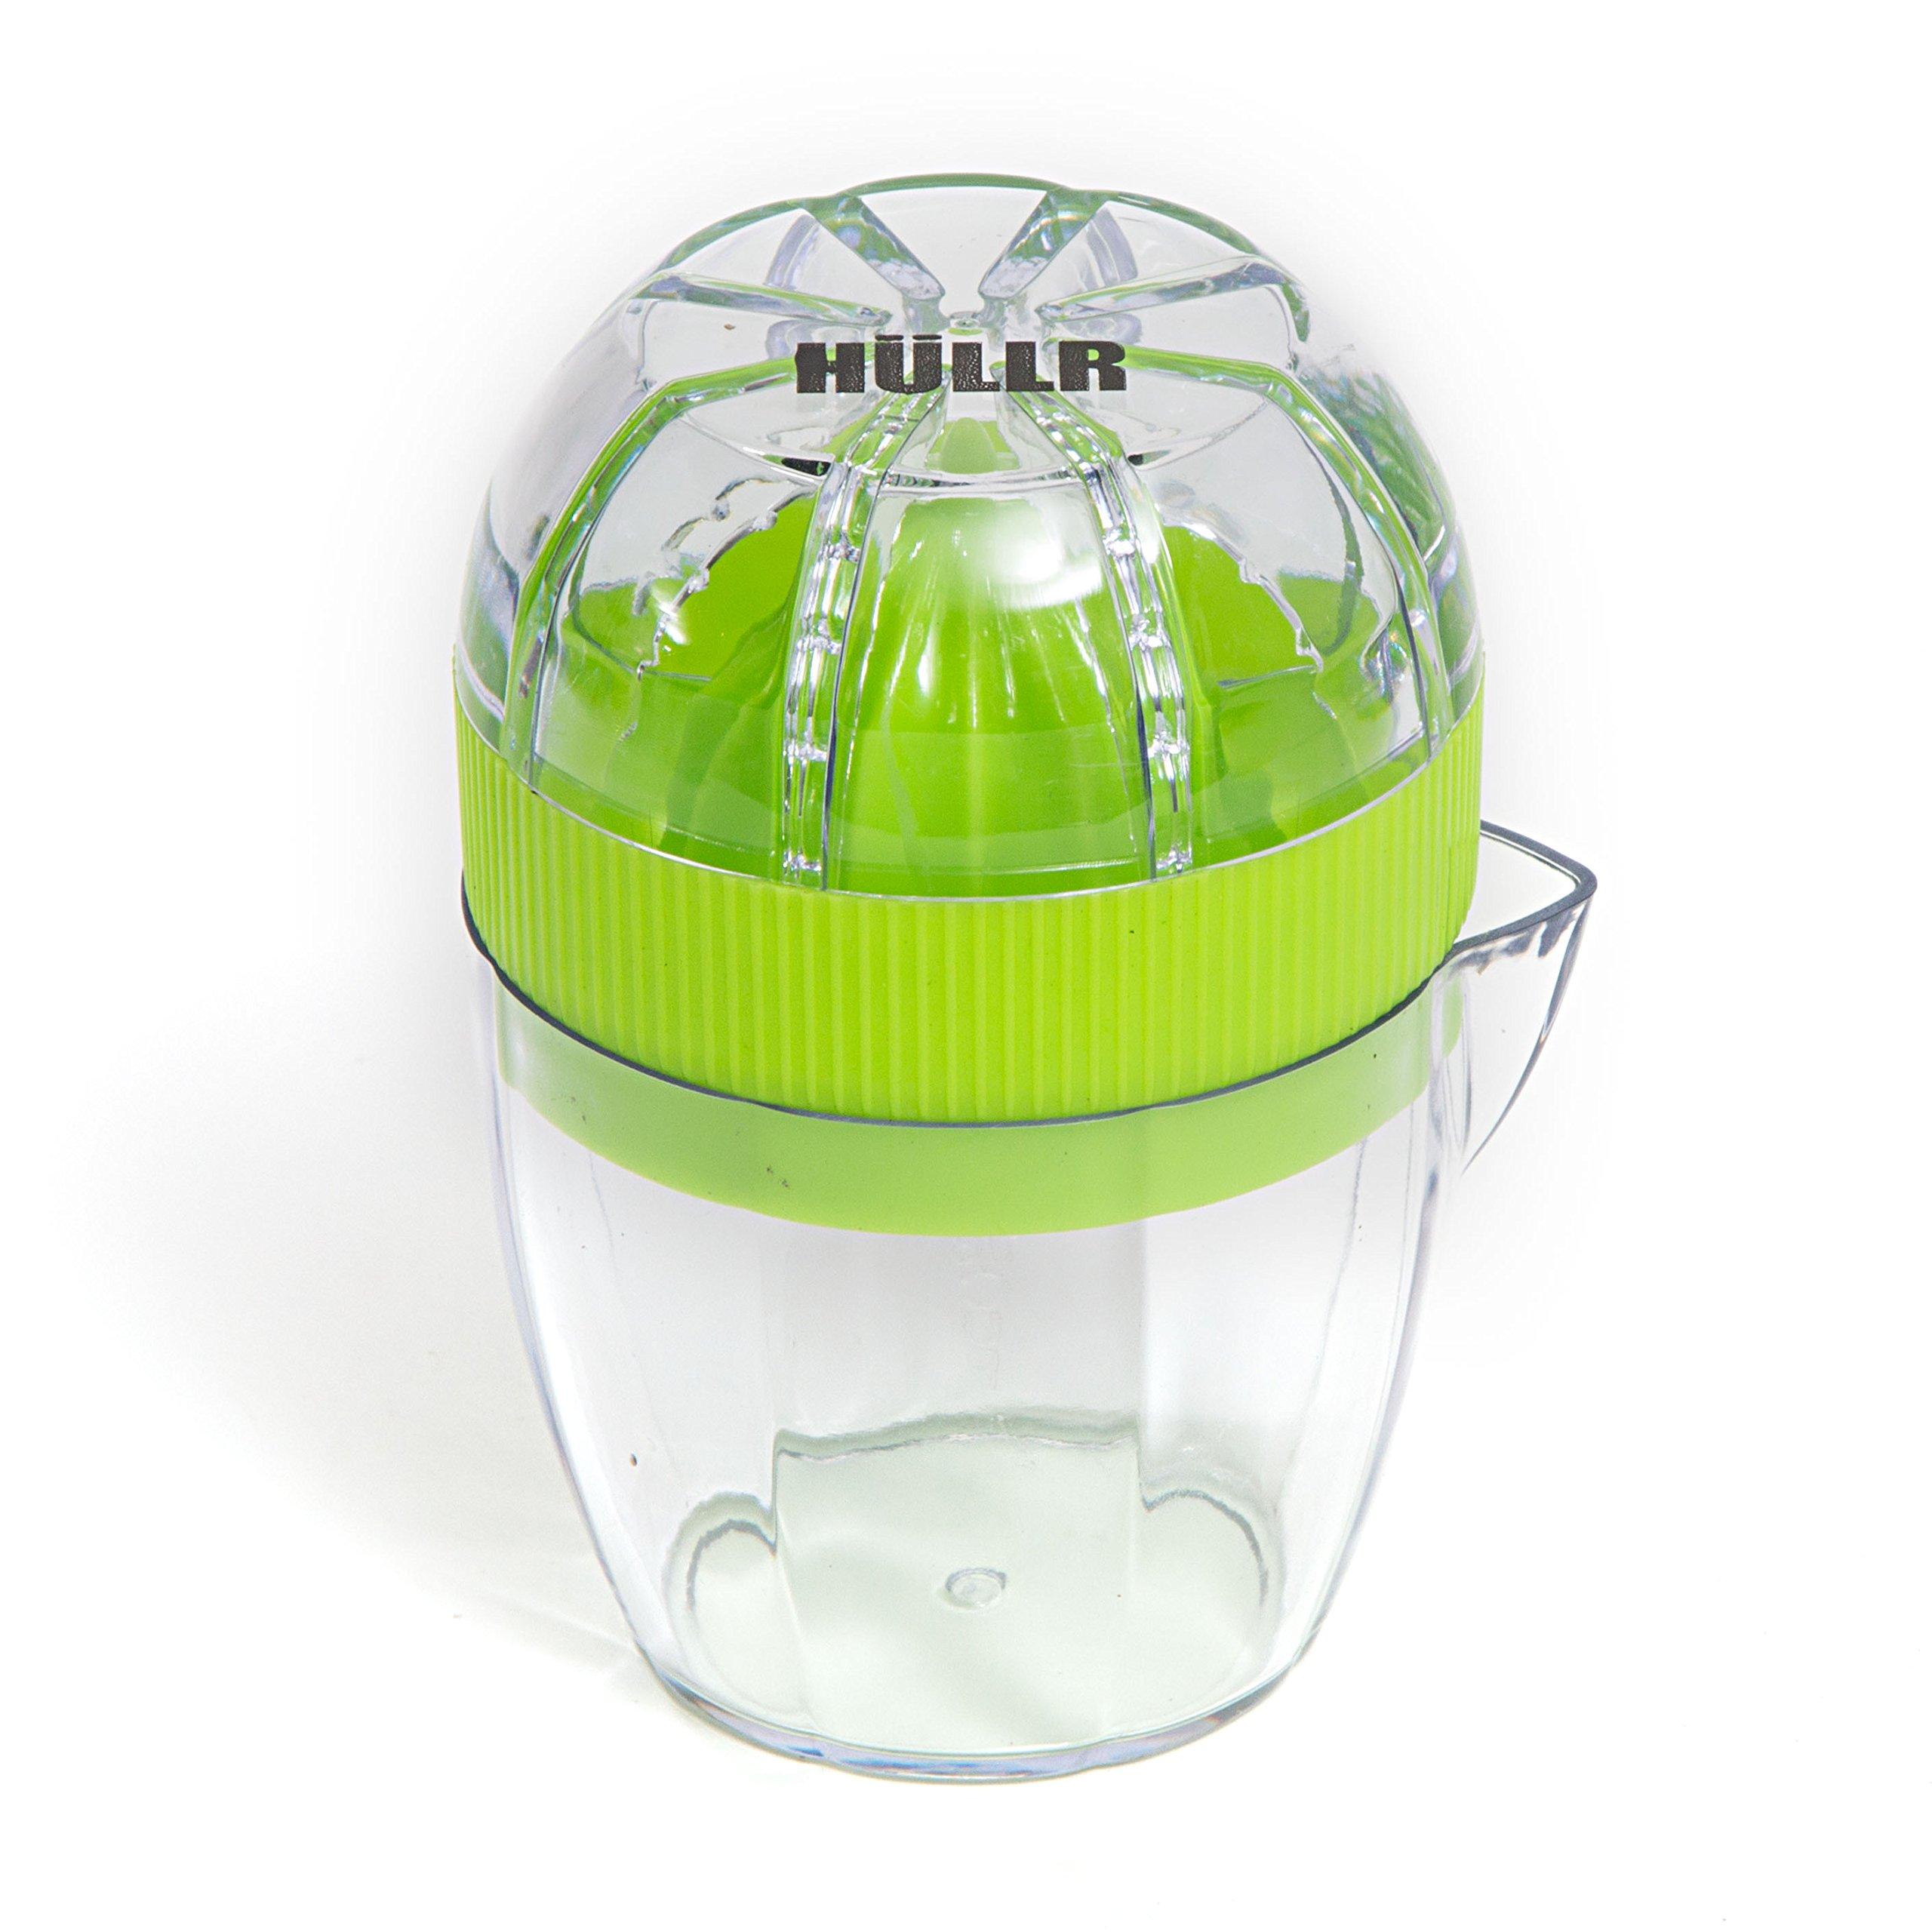 HULLR Lemon Squeezer Lime Juicer Dome Lid and Citrus Storage with Pour Spout